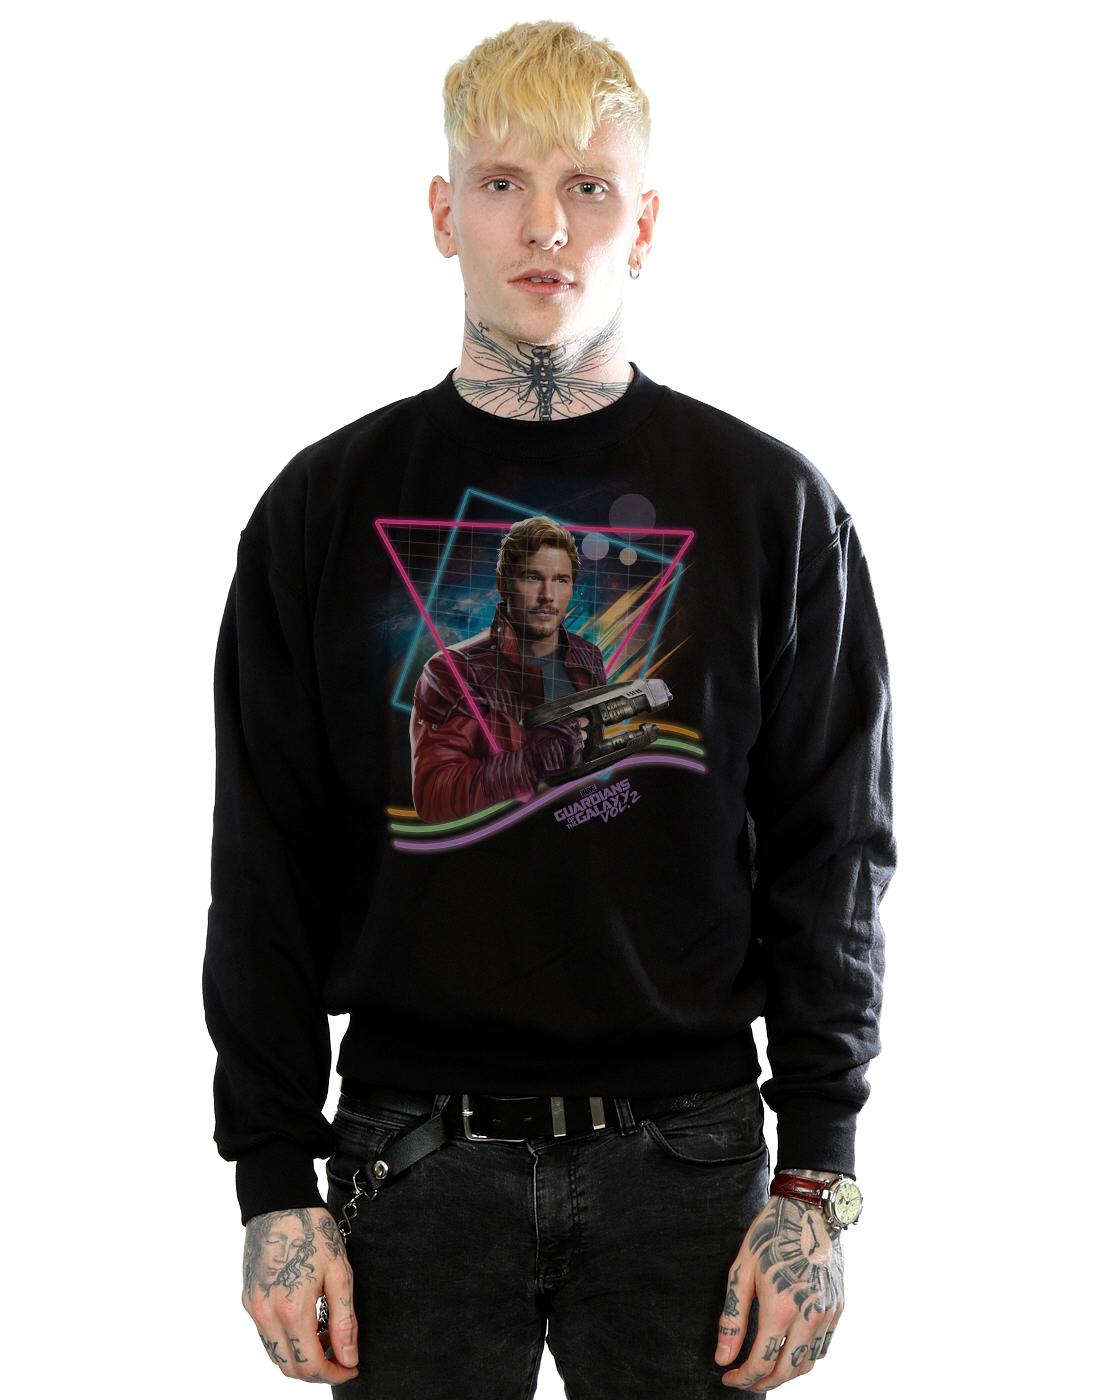 Neon De Lord Galaxie Homme Sweat Les Gardiens Star shirt La Marvel t87RAXnqA